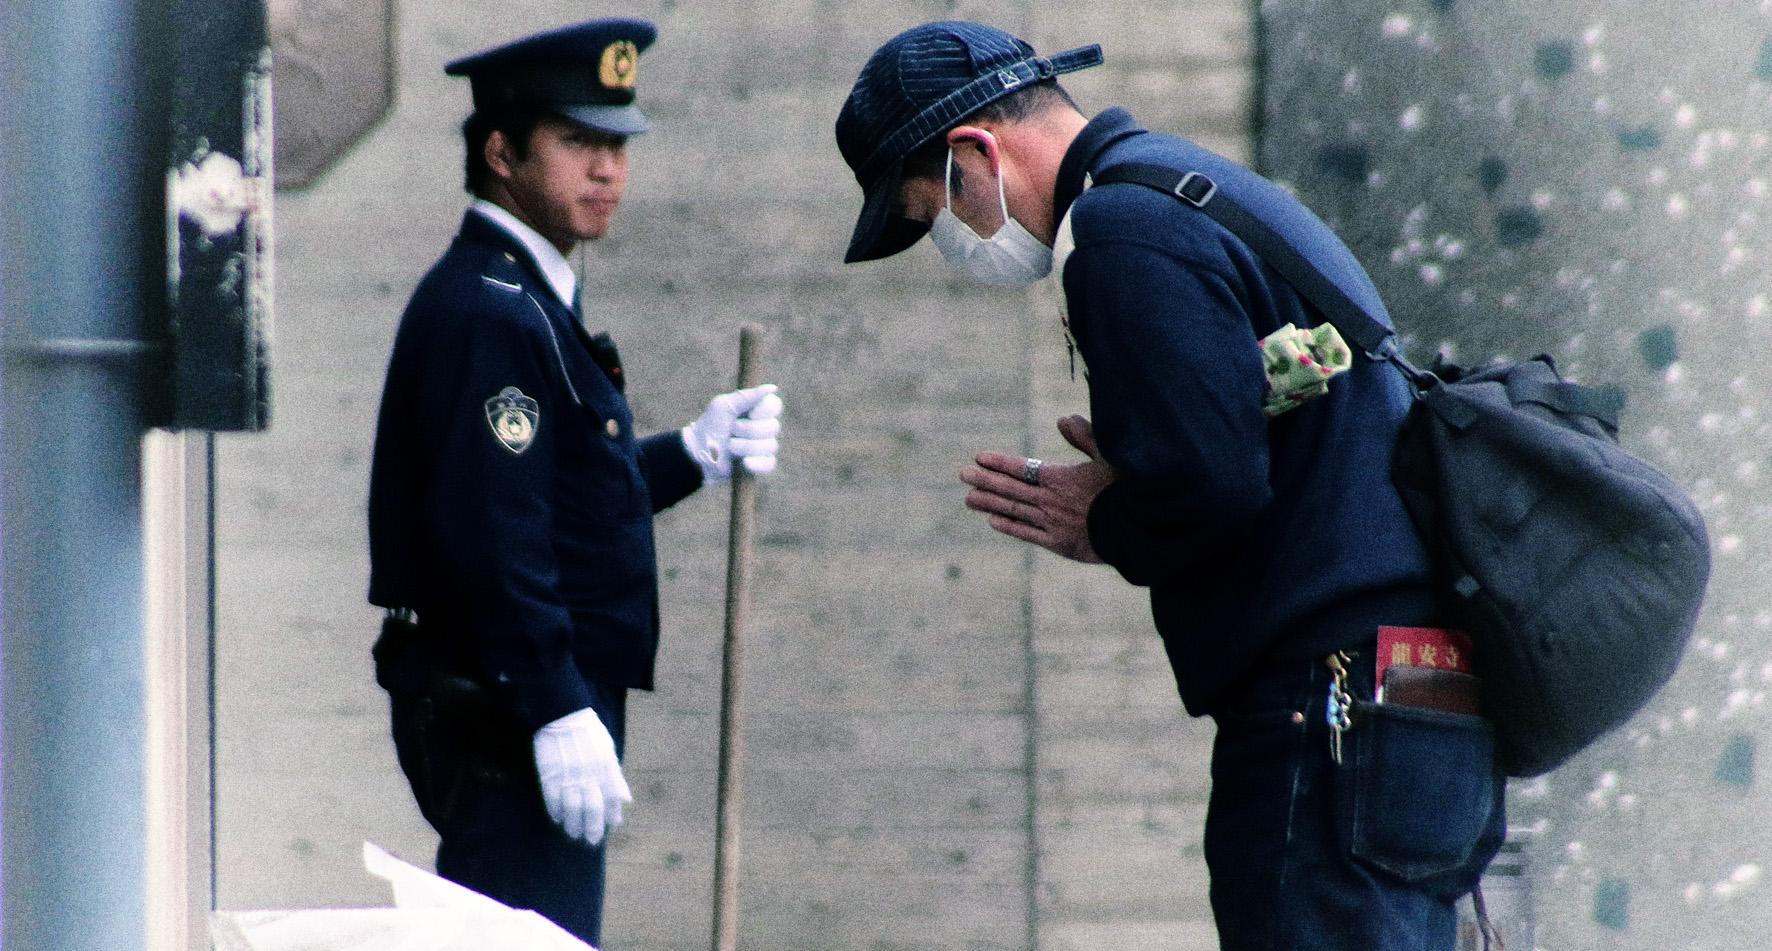 JAPAN-FRANCE-ATTACKS